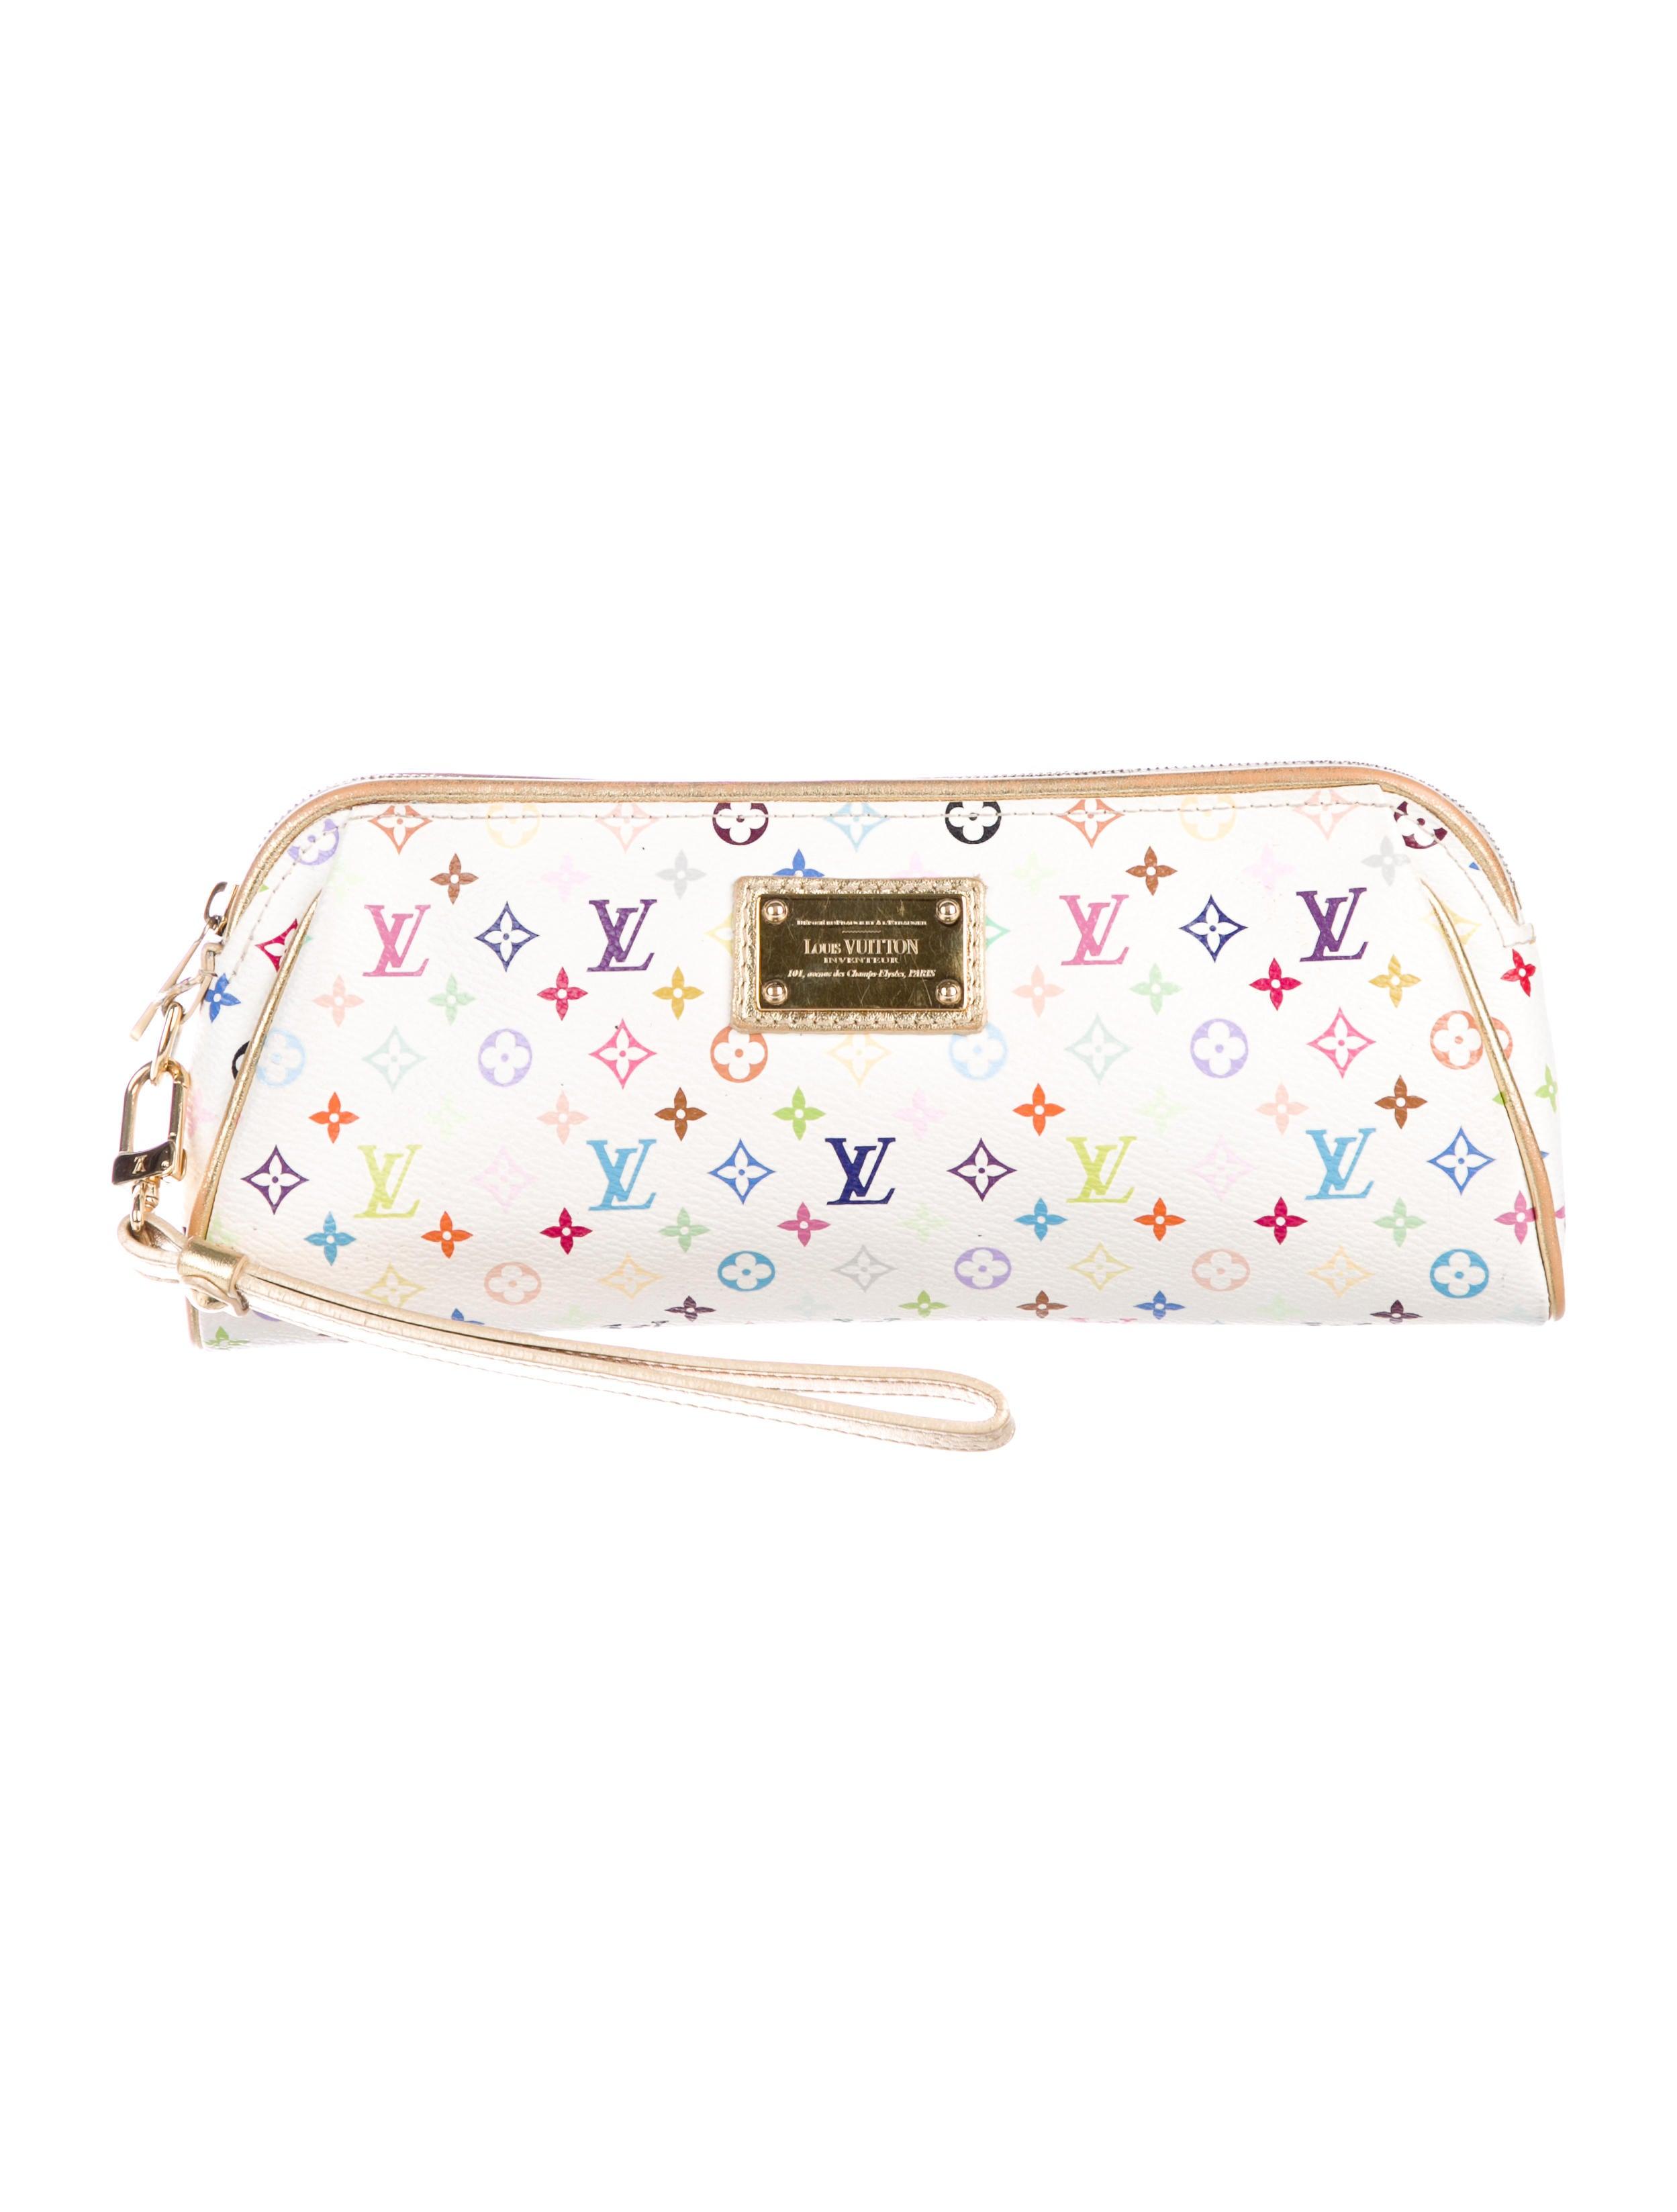 48916877e716 Louis Vuitton Mini Monogram Multicolore Kate Clutch - Handbags ...